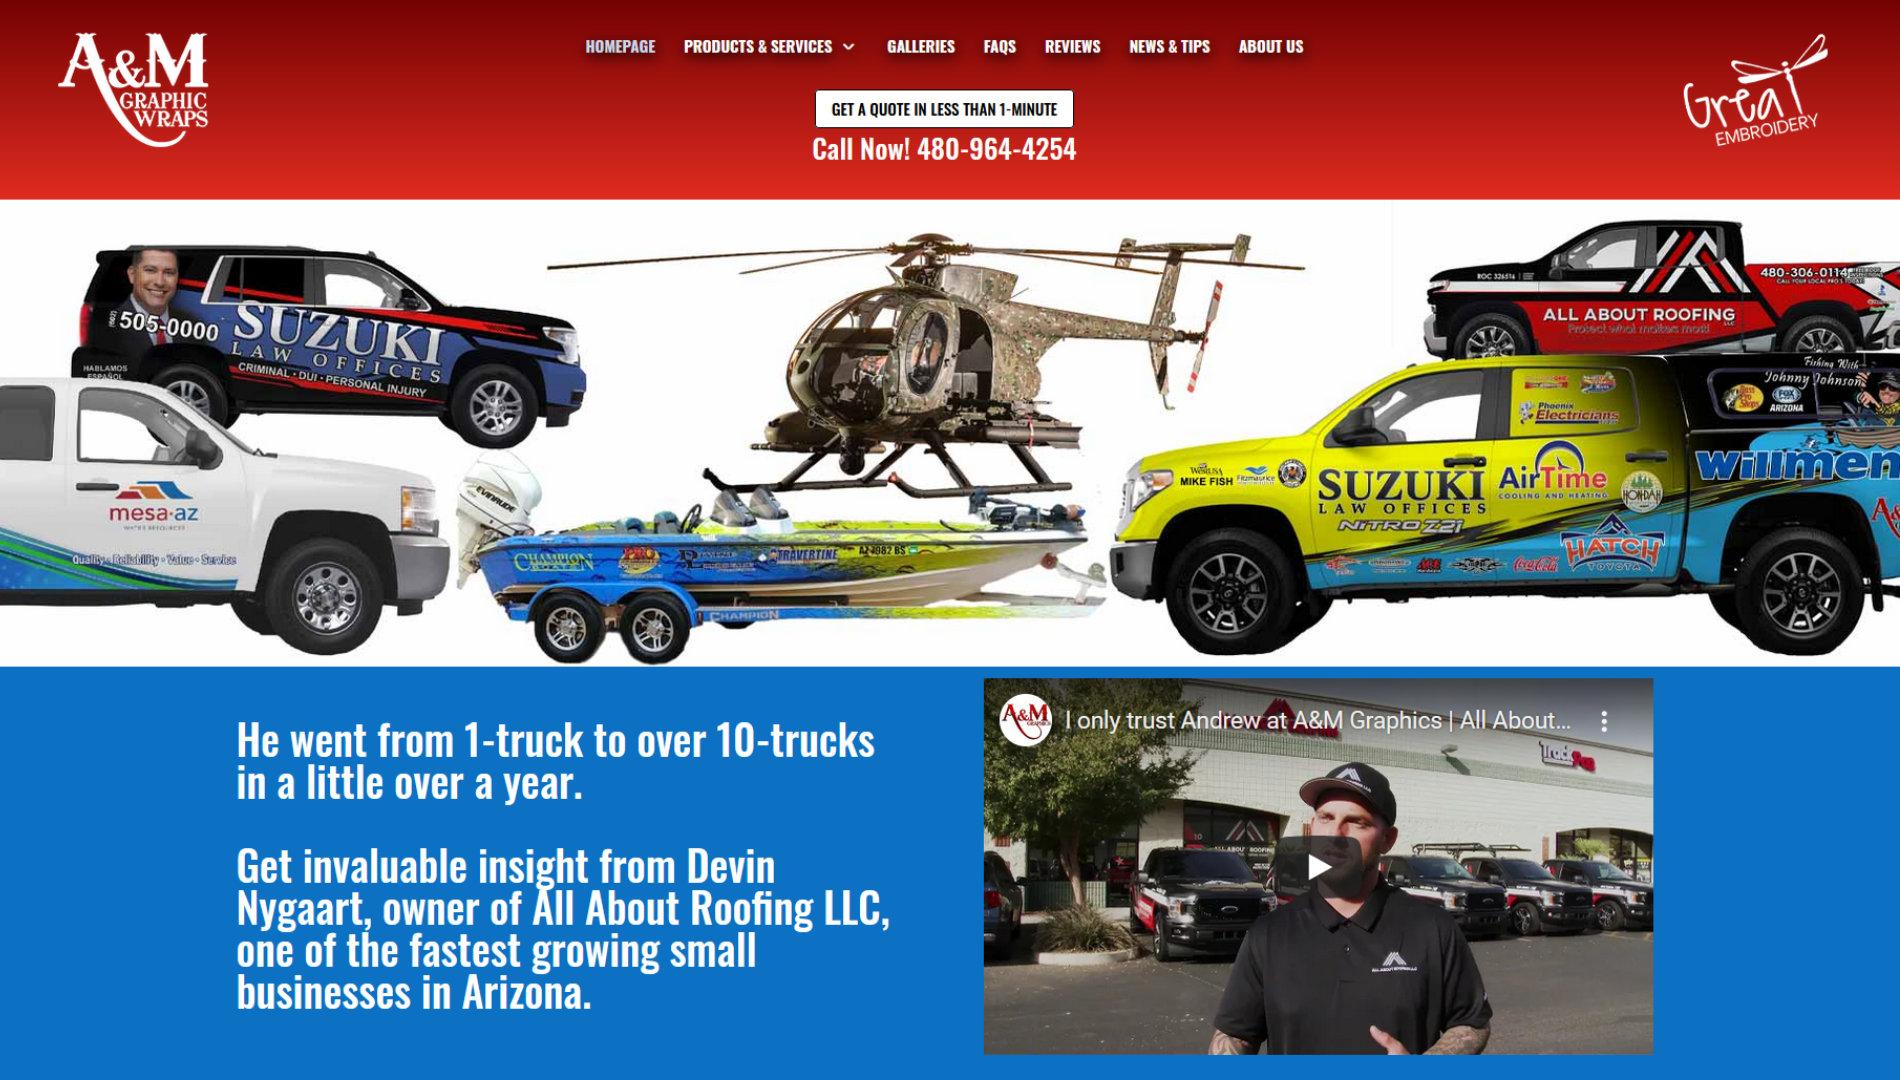 A&M Graphics Fleet Branding in Mesa